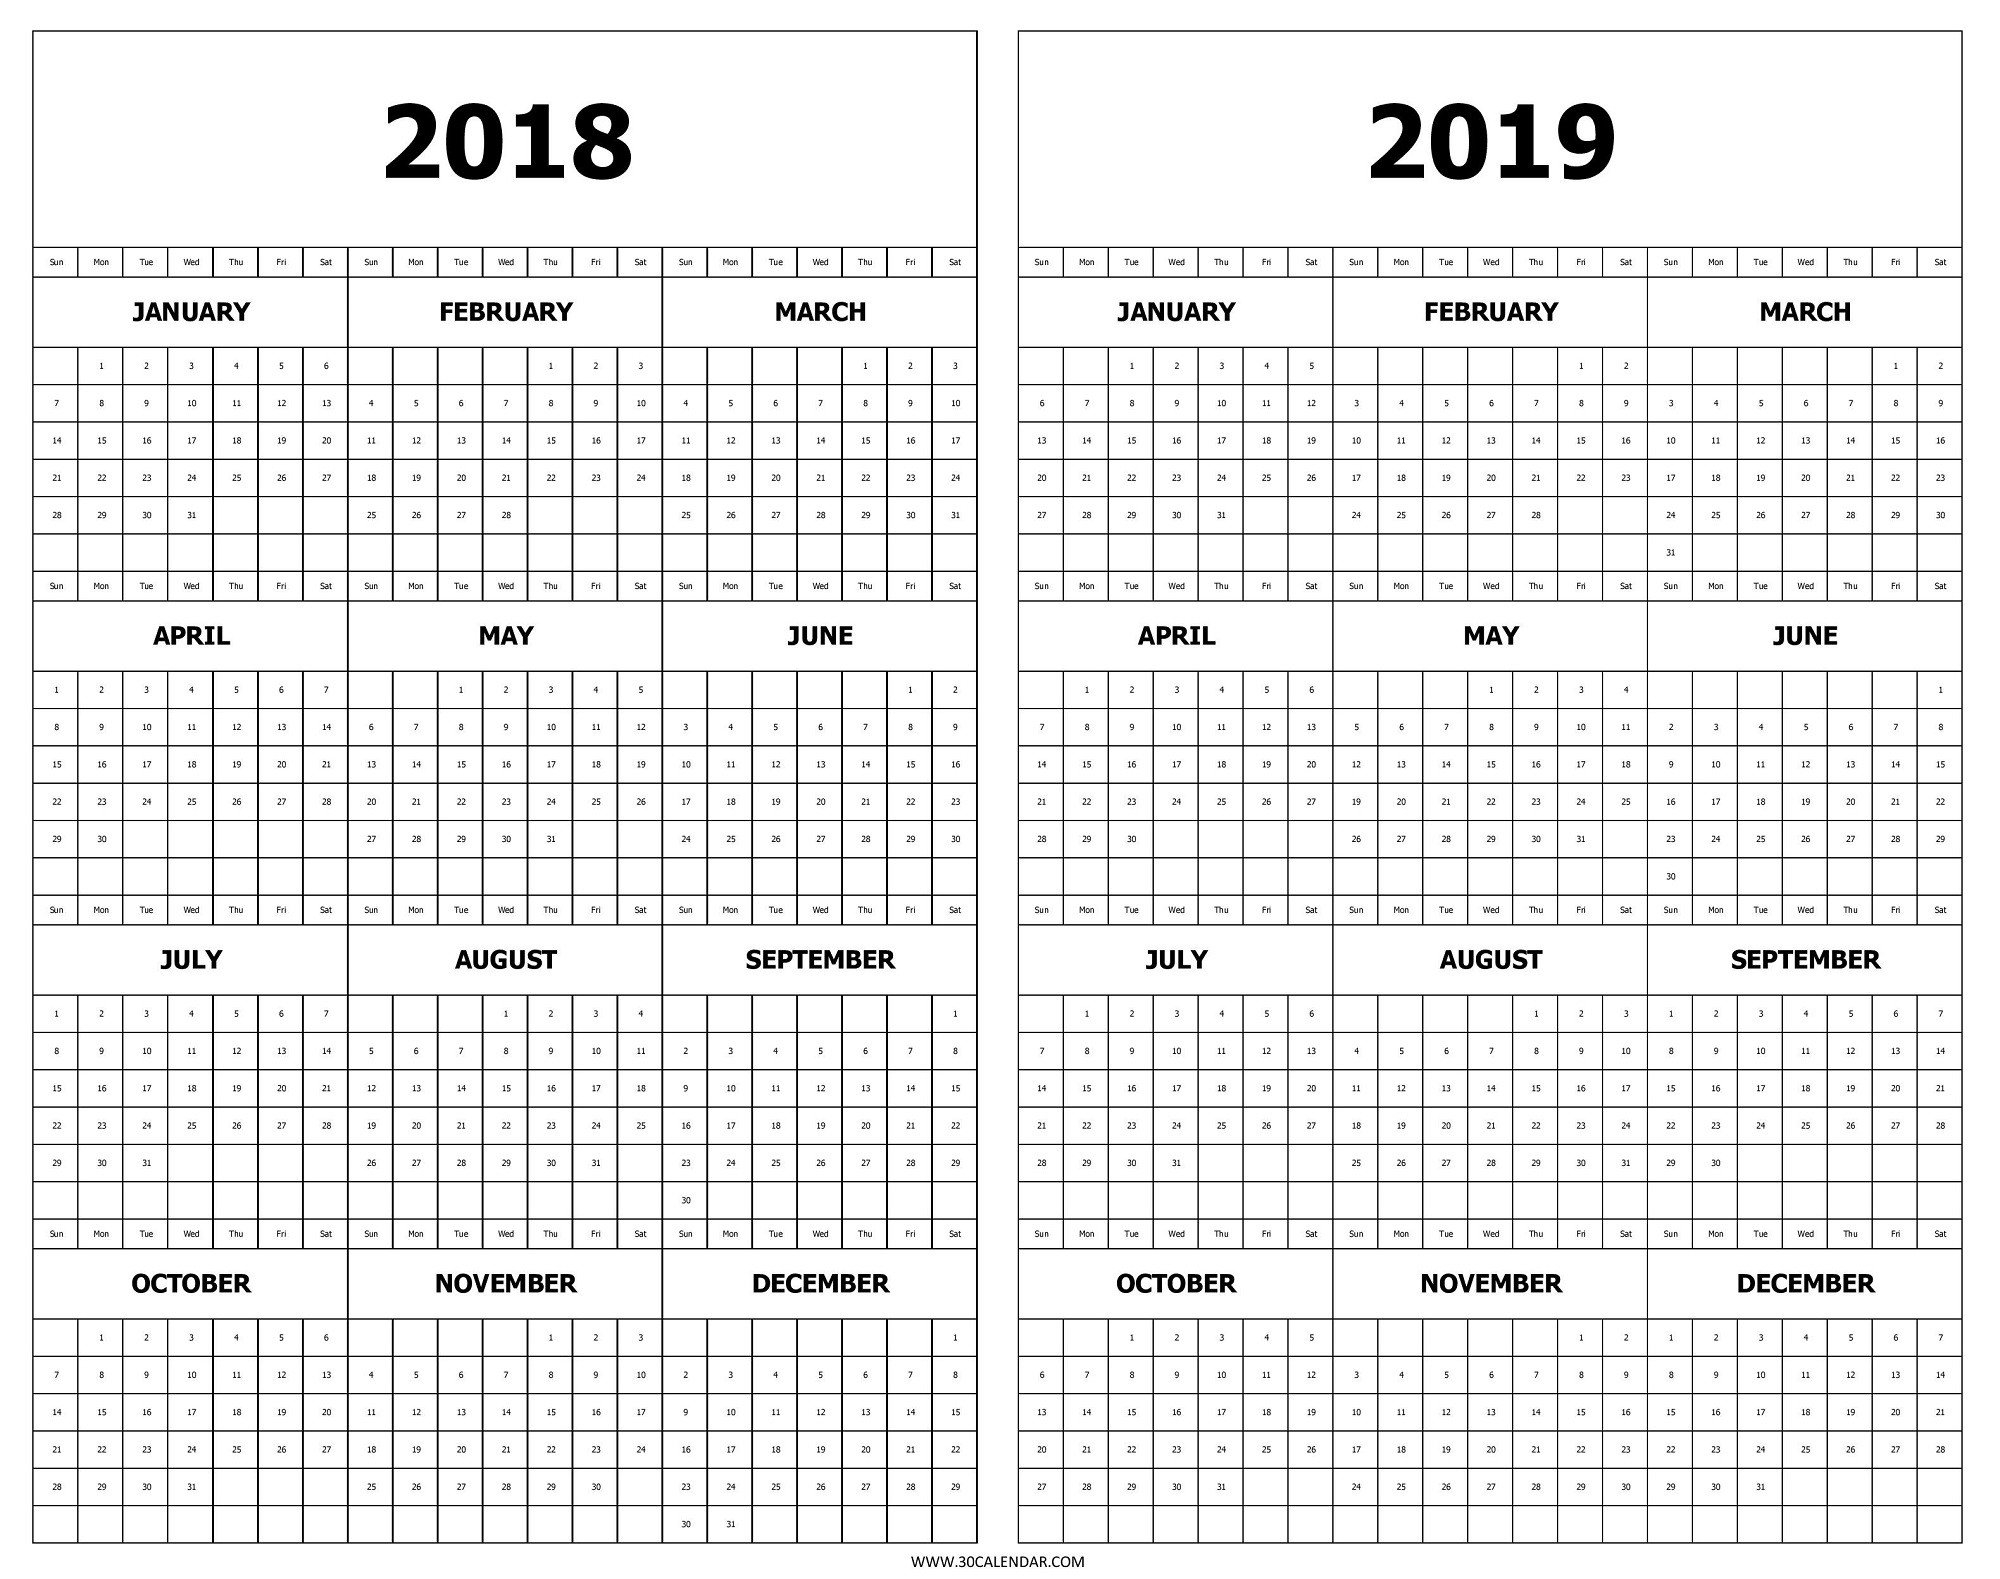 Printable Year At A Glance Calendar 2019 Calendar 2018 And 2019 Calendar 2019 Year At A Glance